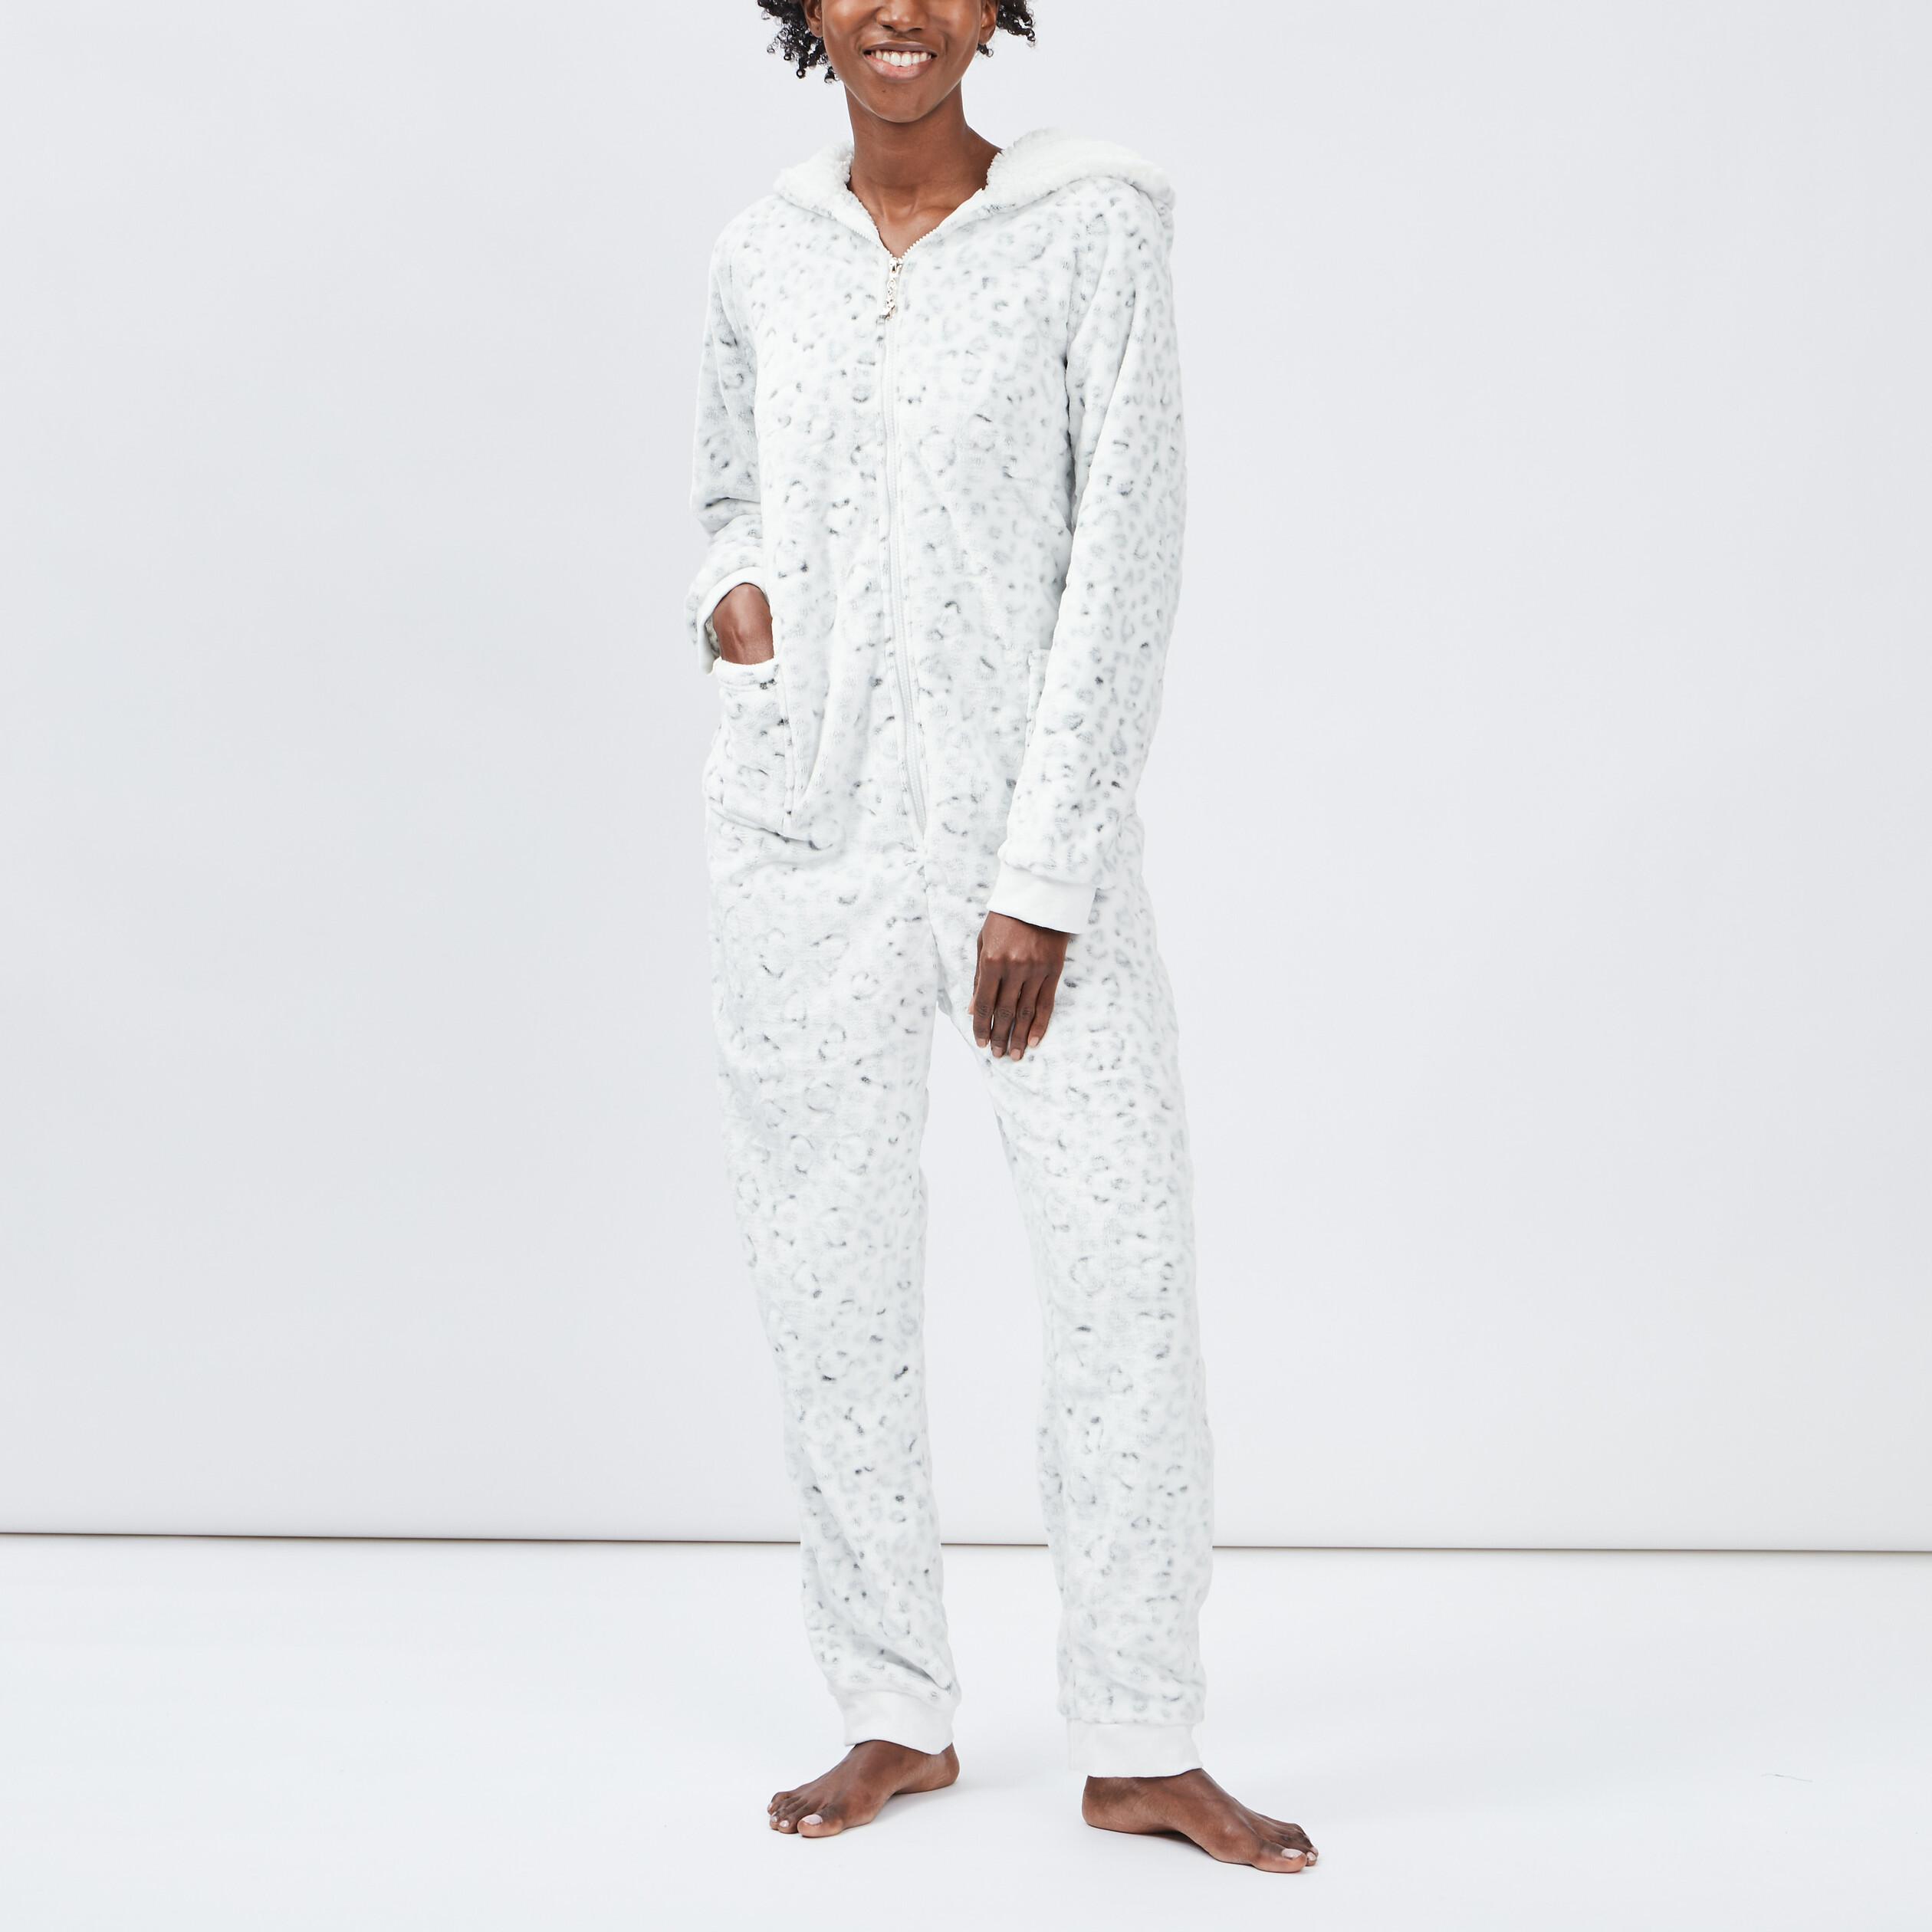 iHAZA Combinaison Pyjamas de No/ël Gar/çon Filles B/éb/é Famille Ray/é D/écontract/é V/êtements de Nuit